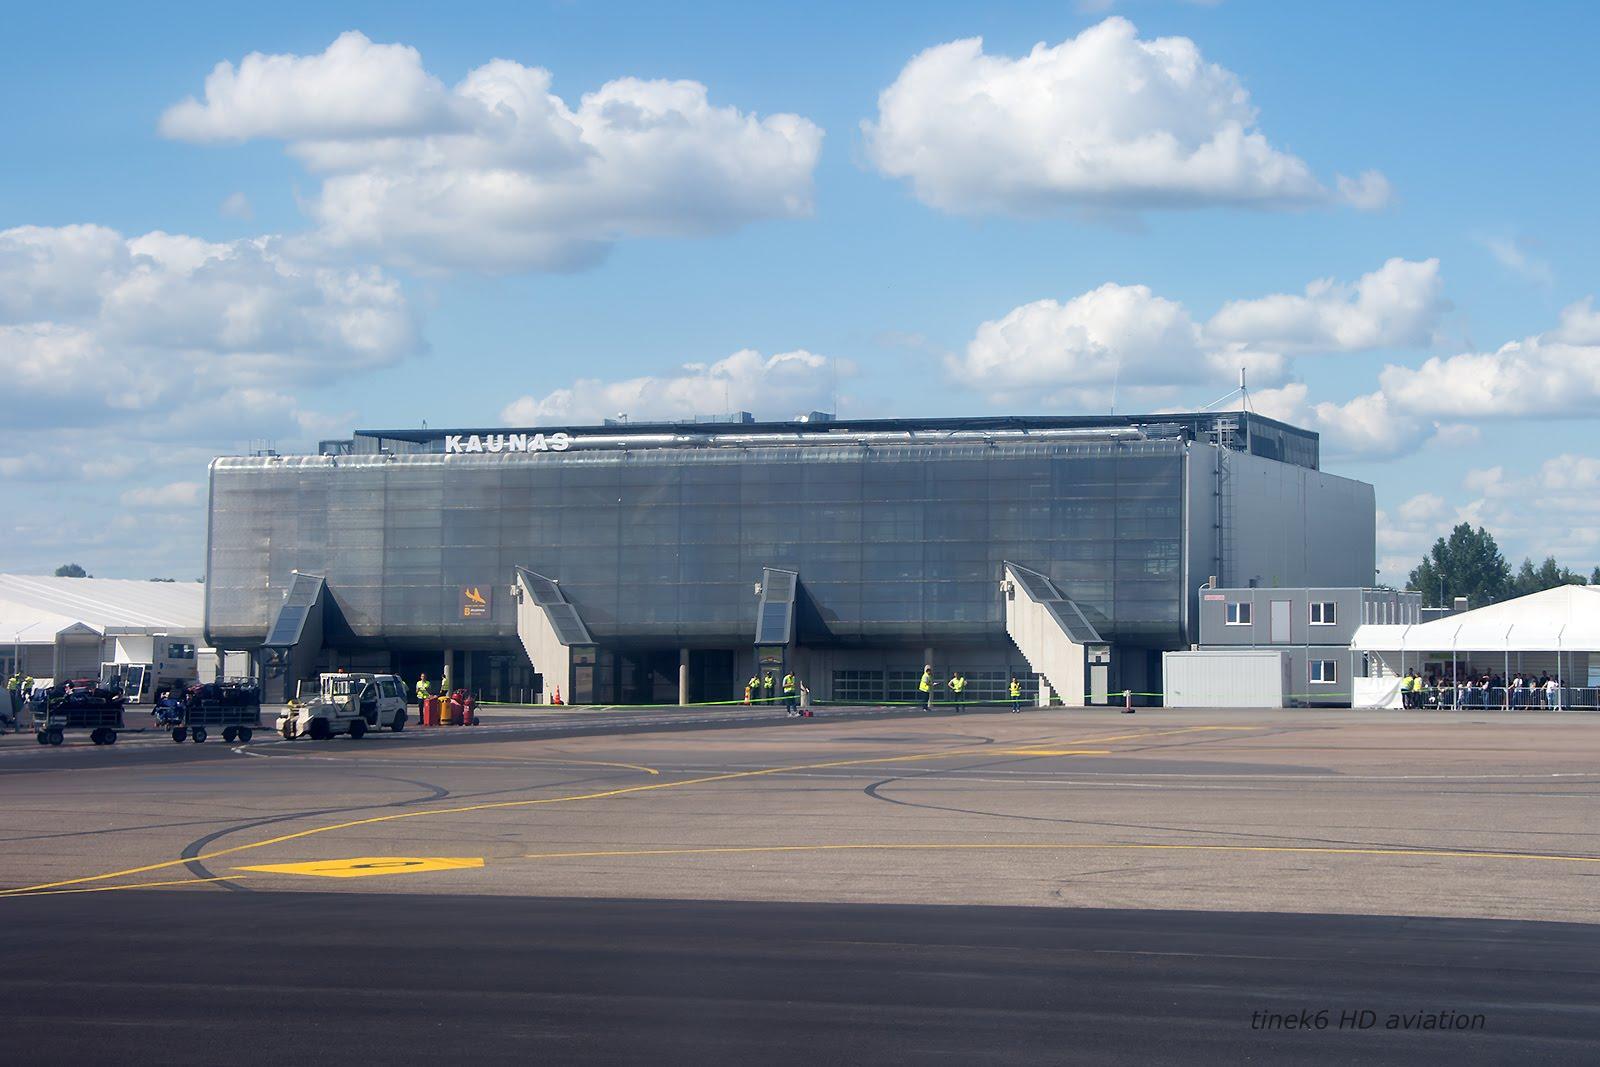 Aeroporto Waw : Tinek6 hd aviation: kaunas airport. 2017.07.22 23